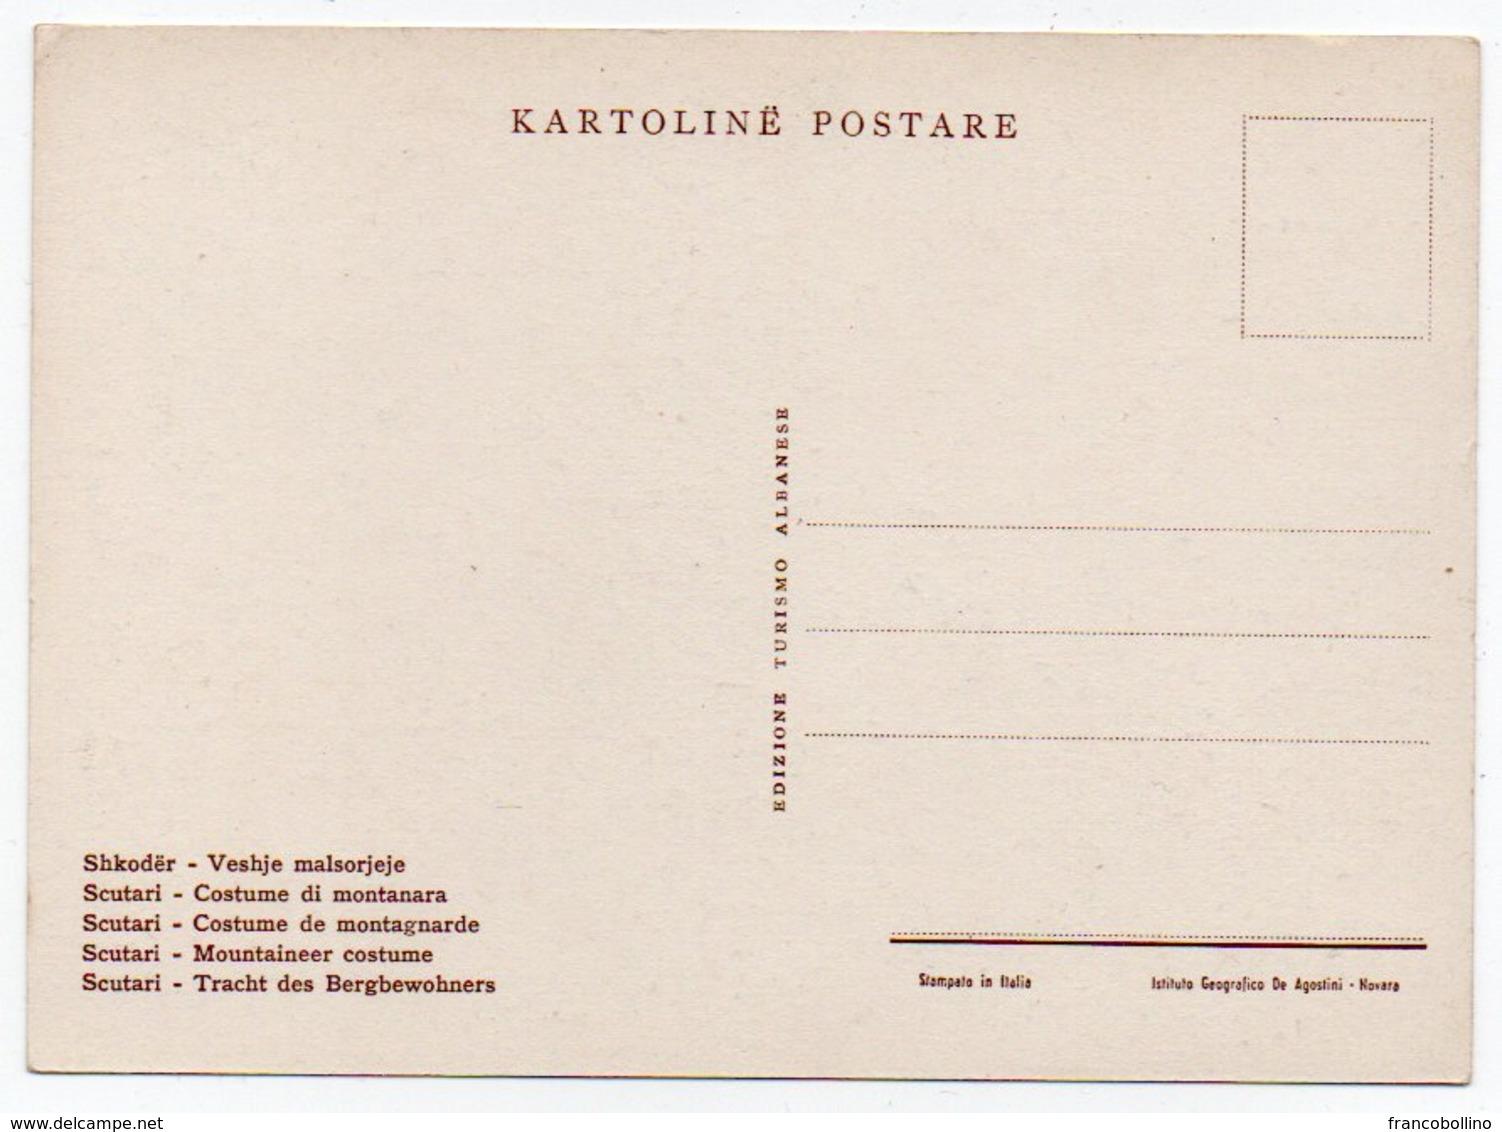 ALBANIE/ALBANIA - SCUTARI/SHKODER COSTUMI DI MONTANARA / COSTUMES / FOLKLORE (ILL.F.PULLUMI-1940) - Albania